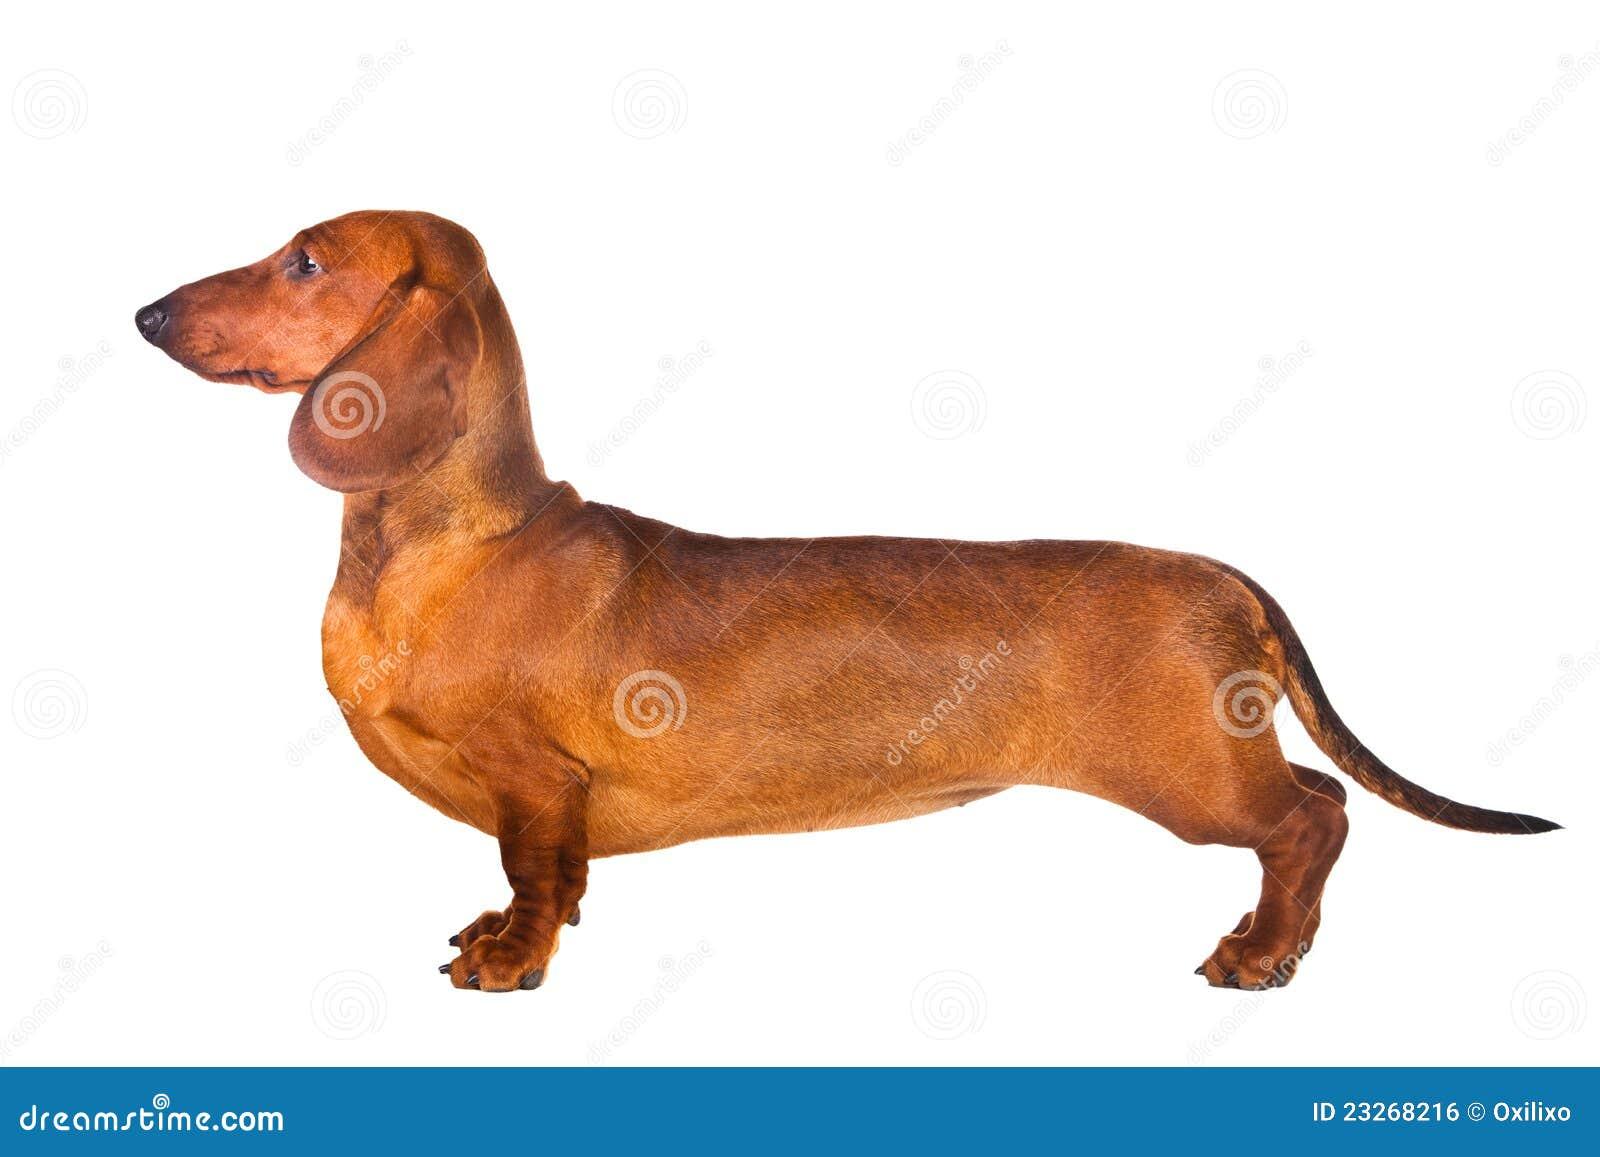 Dachshund Dog  Dachshund Dog